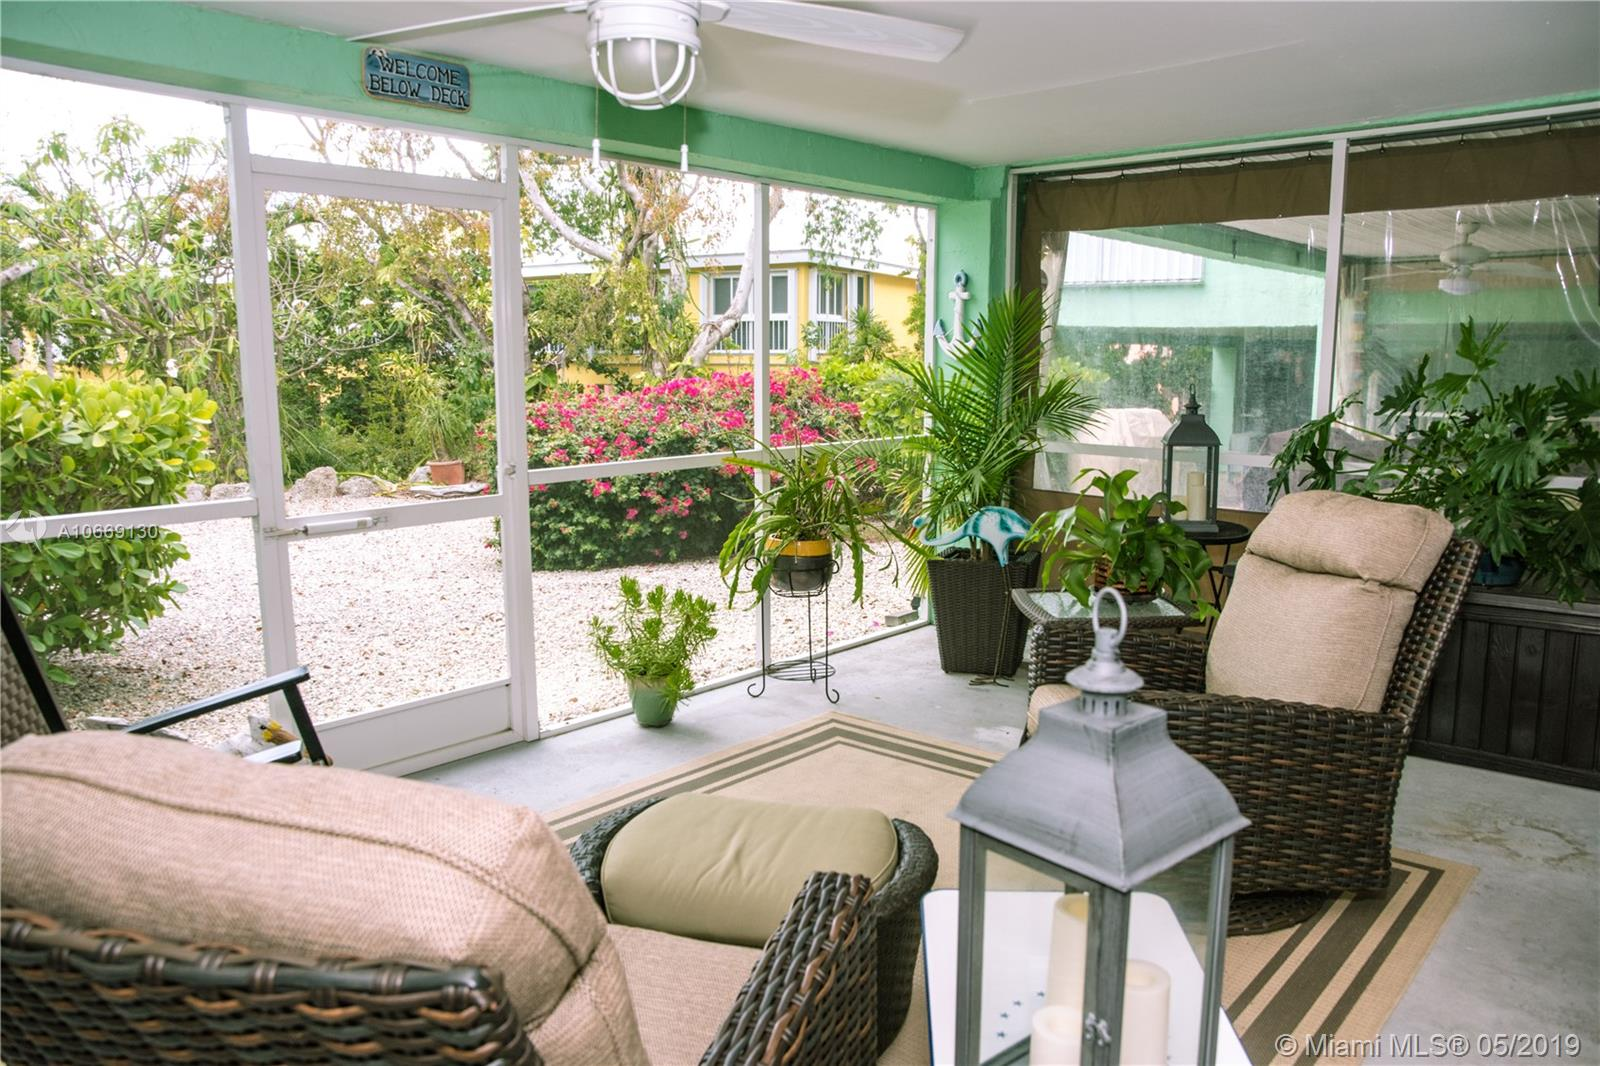 9808 Magellan #9808, Other City - Keys/Islands/Caribb, FL 33037 - Other City - Keys/Islands/Caribb, FL real estate listing